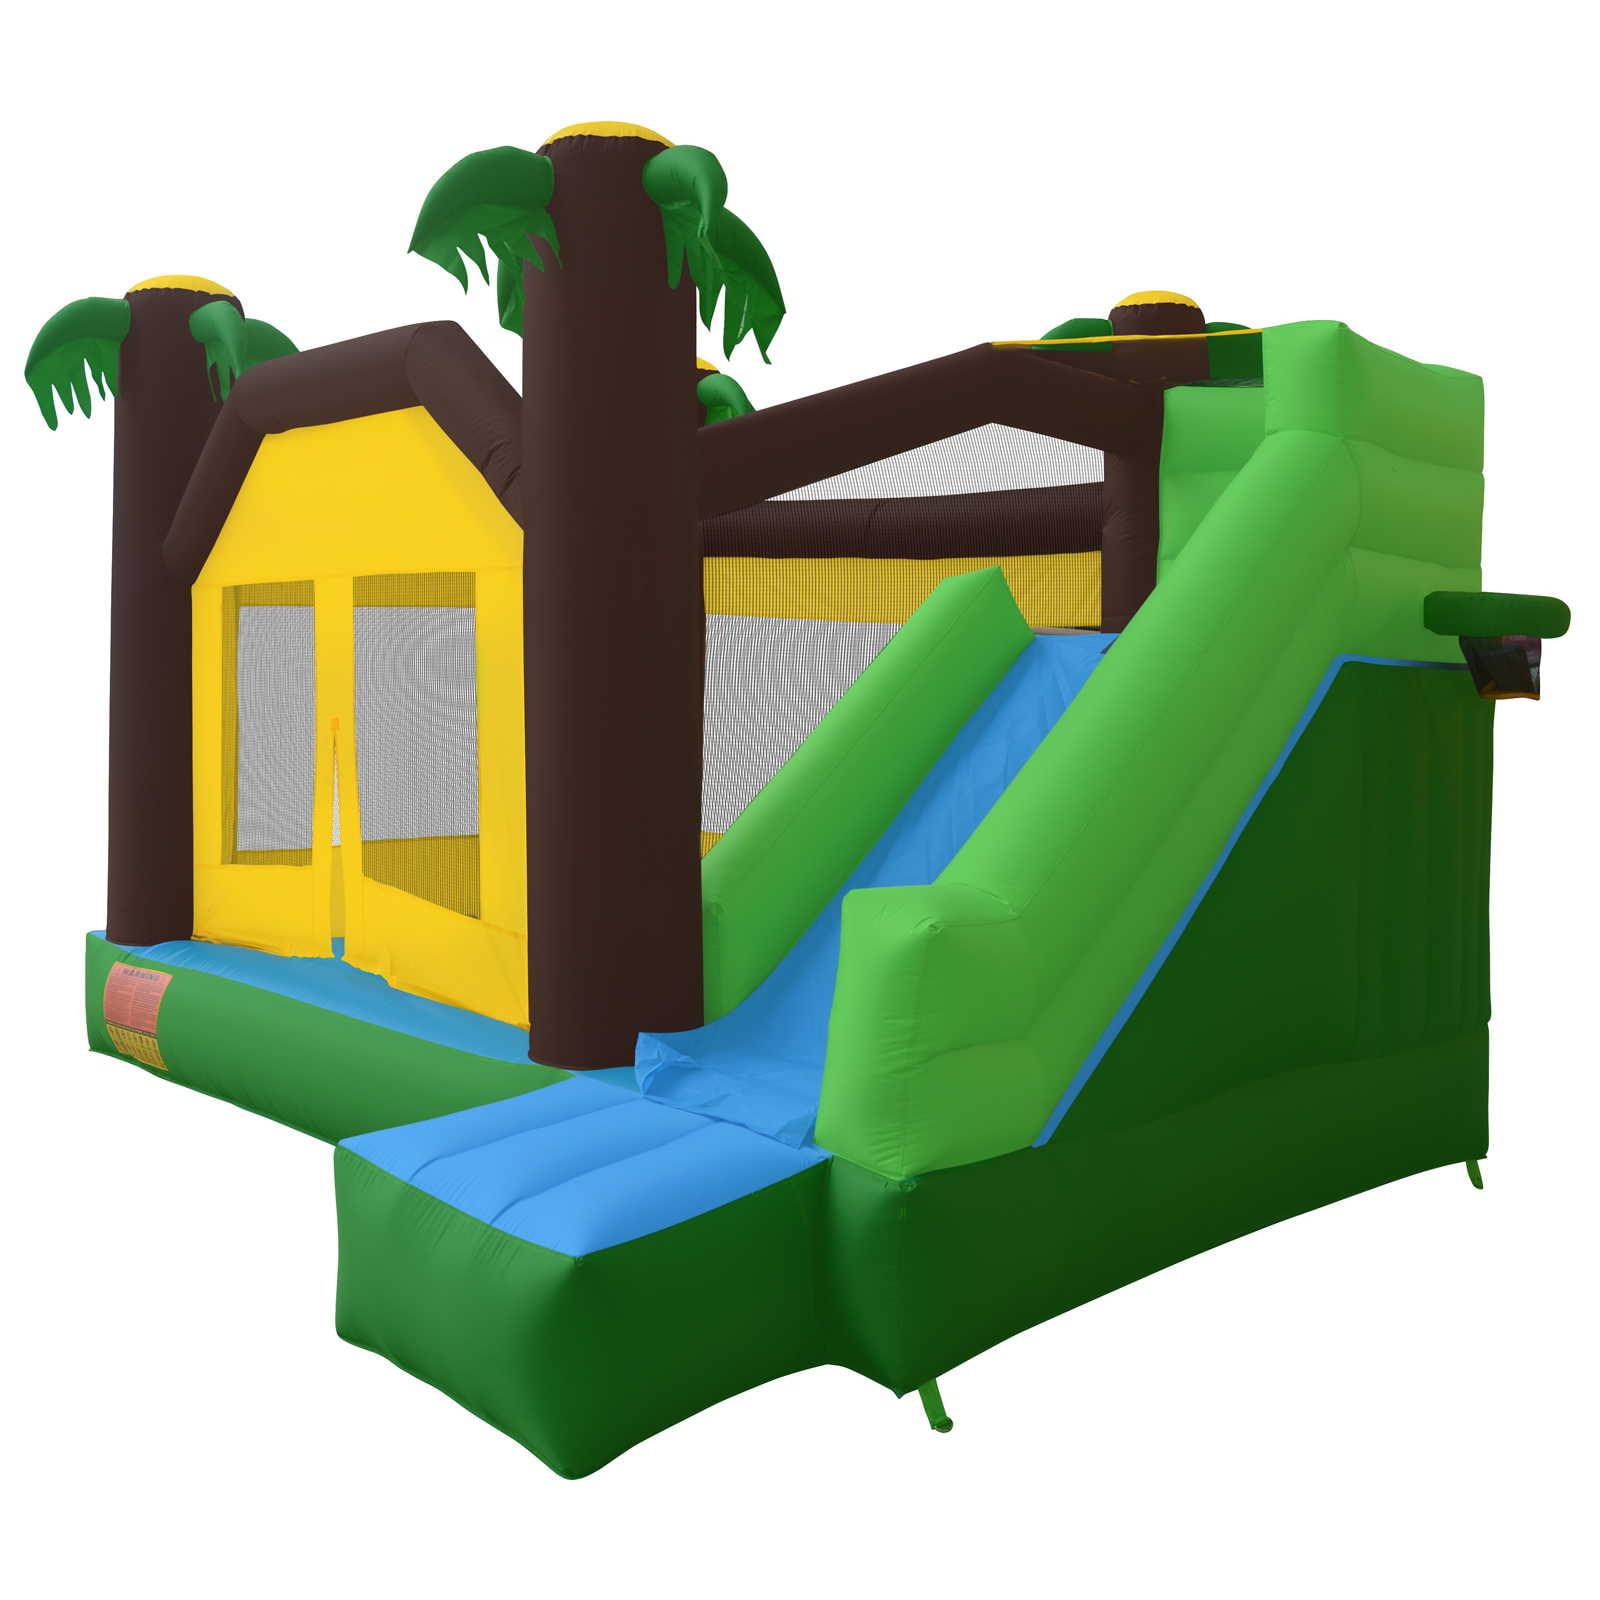 Cloud Nine Jungle Jumper Bounce House - Inflatable Bounce...